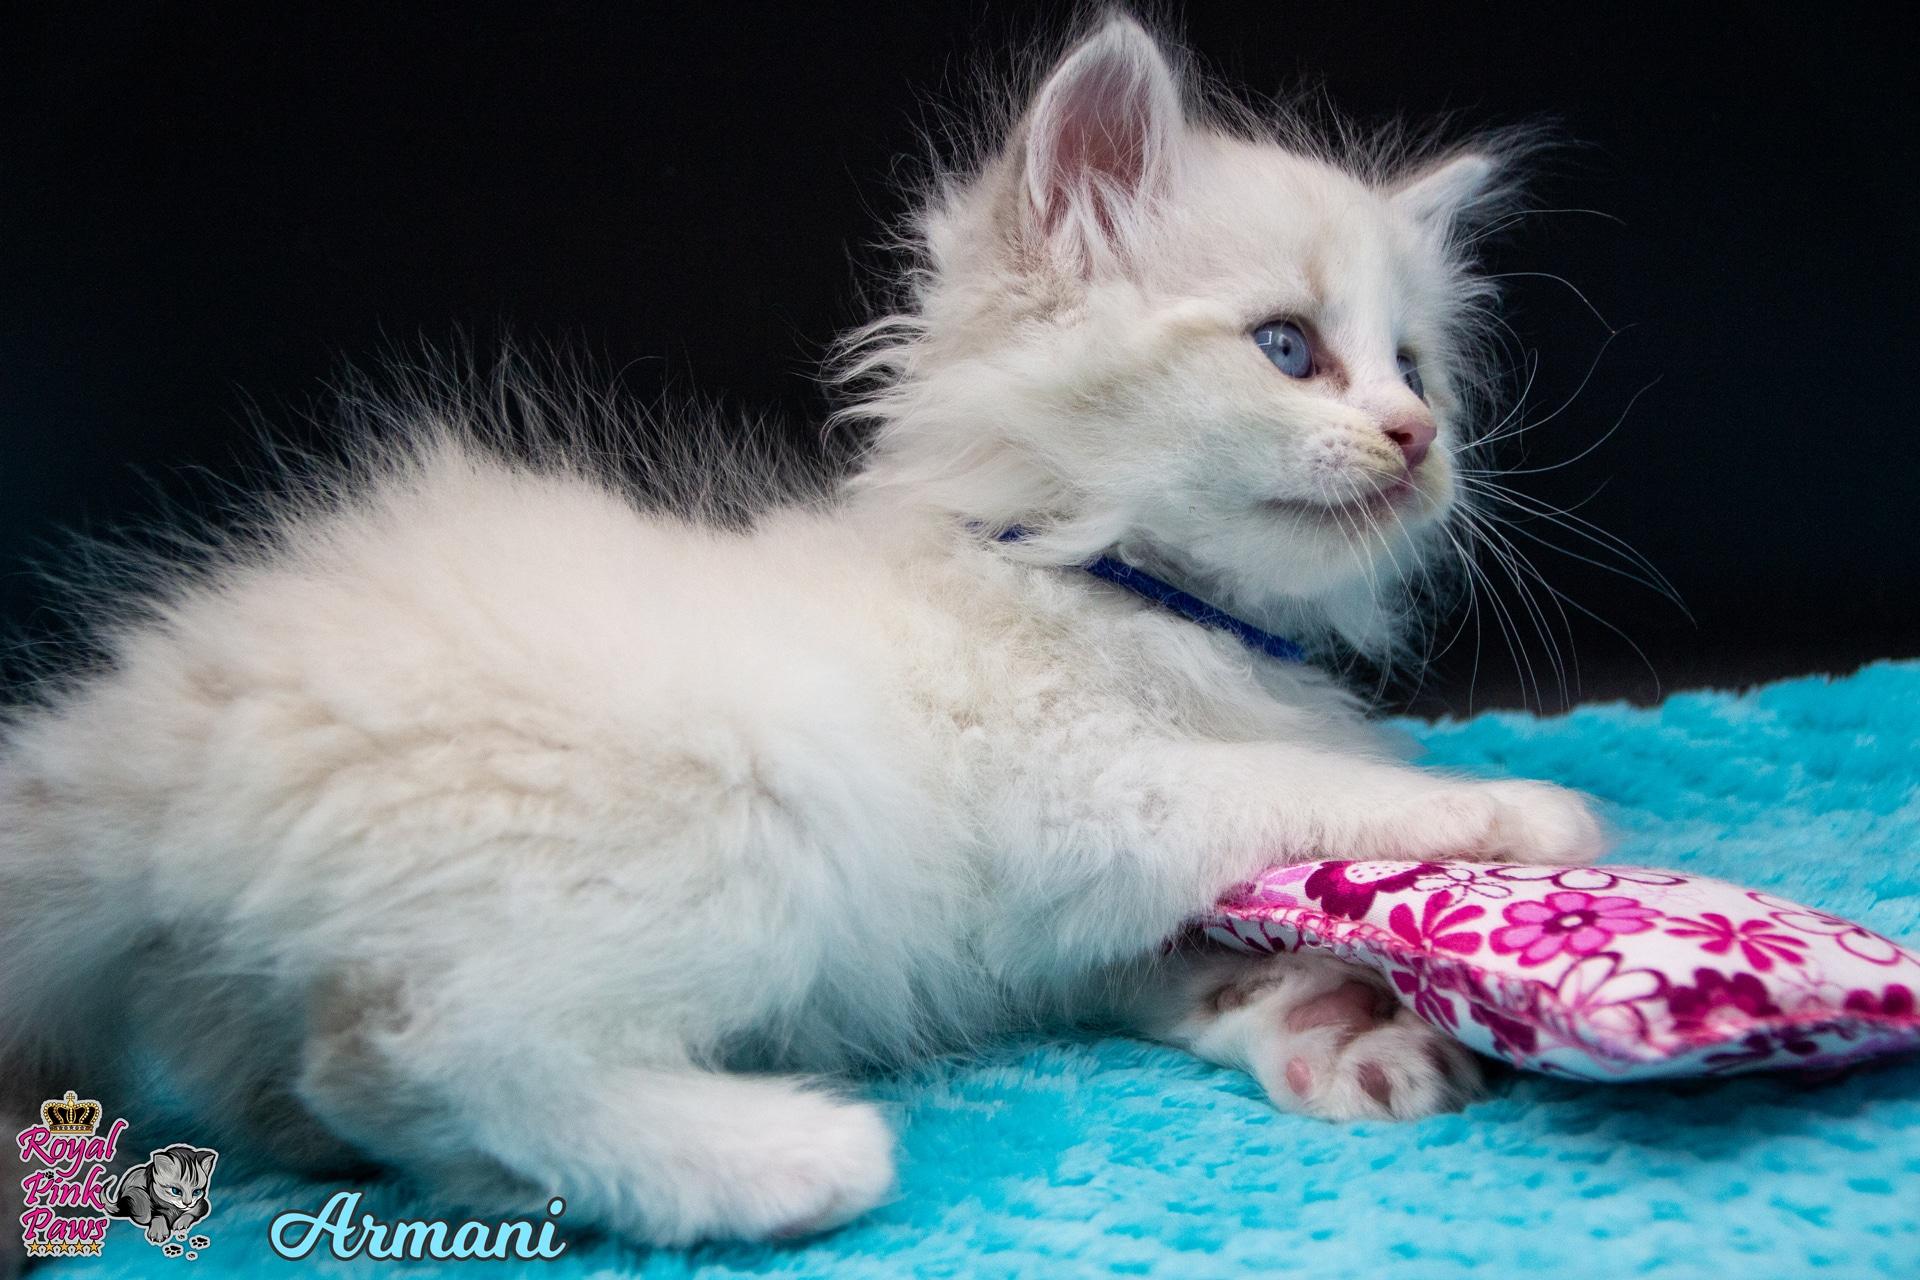 Neva Masquarade - Armani Royal Pink Paws